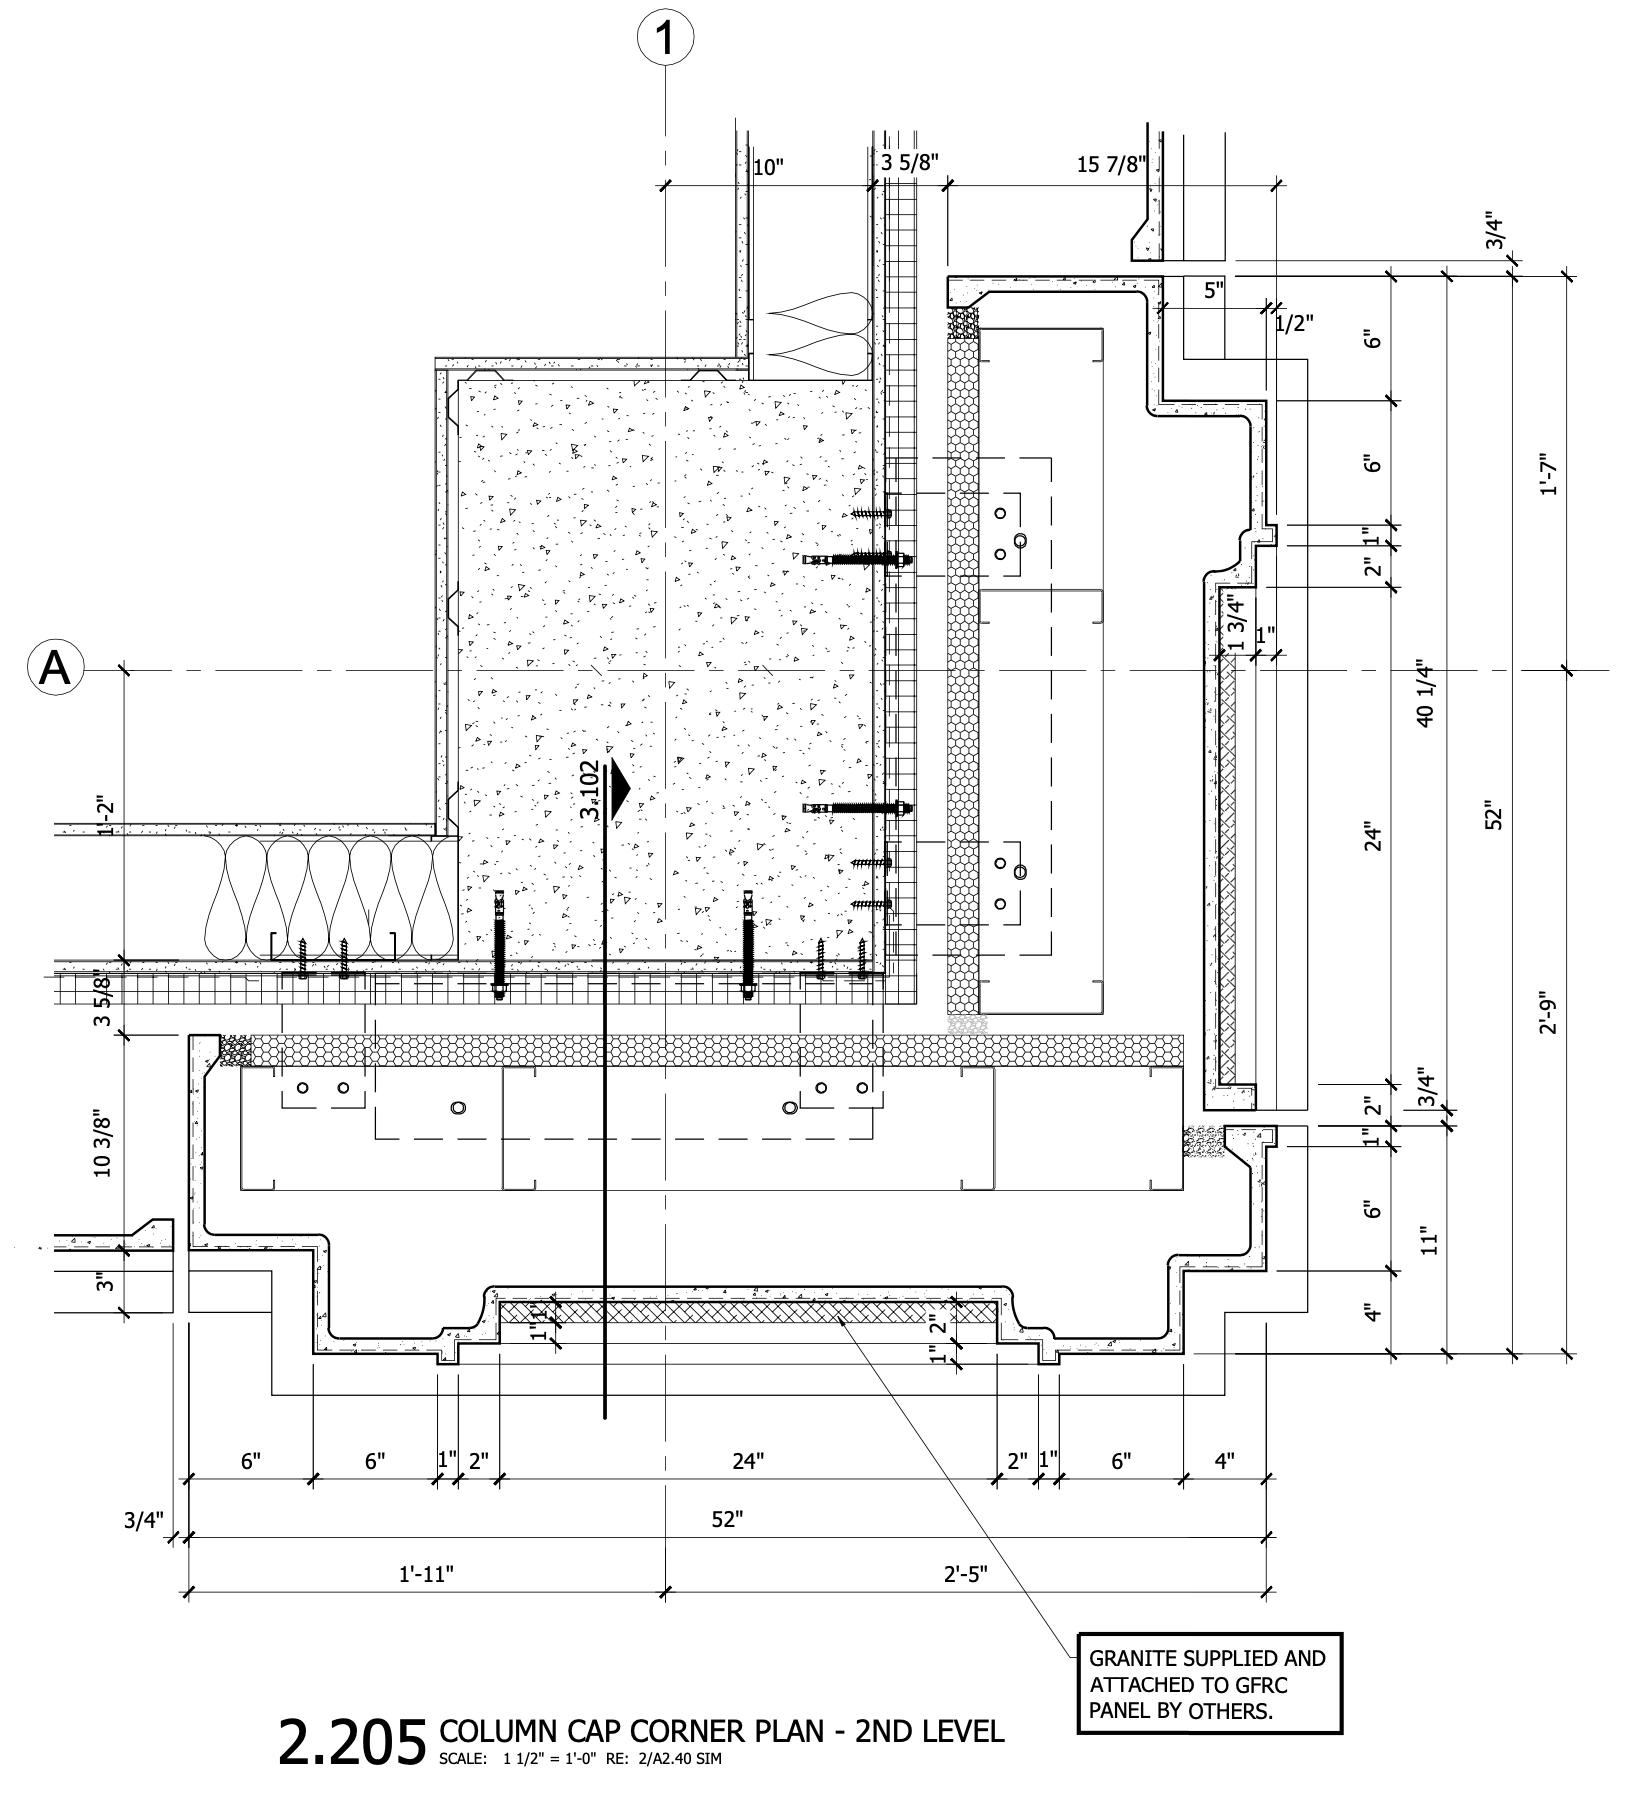 Marriott Hotel CAD Drawing - Section 2_205 - column cap corner plan - 2nd level